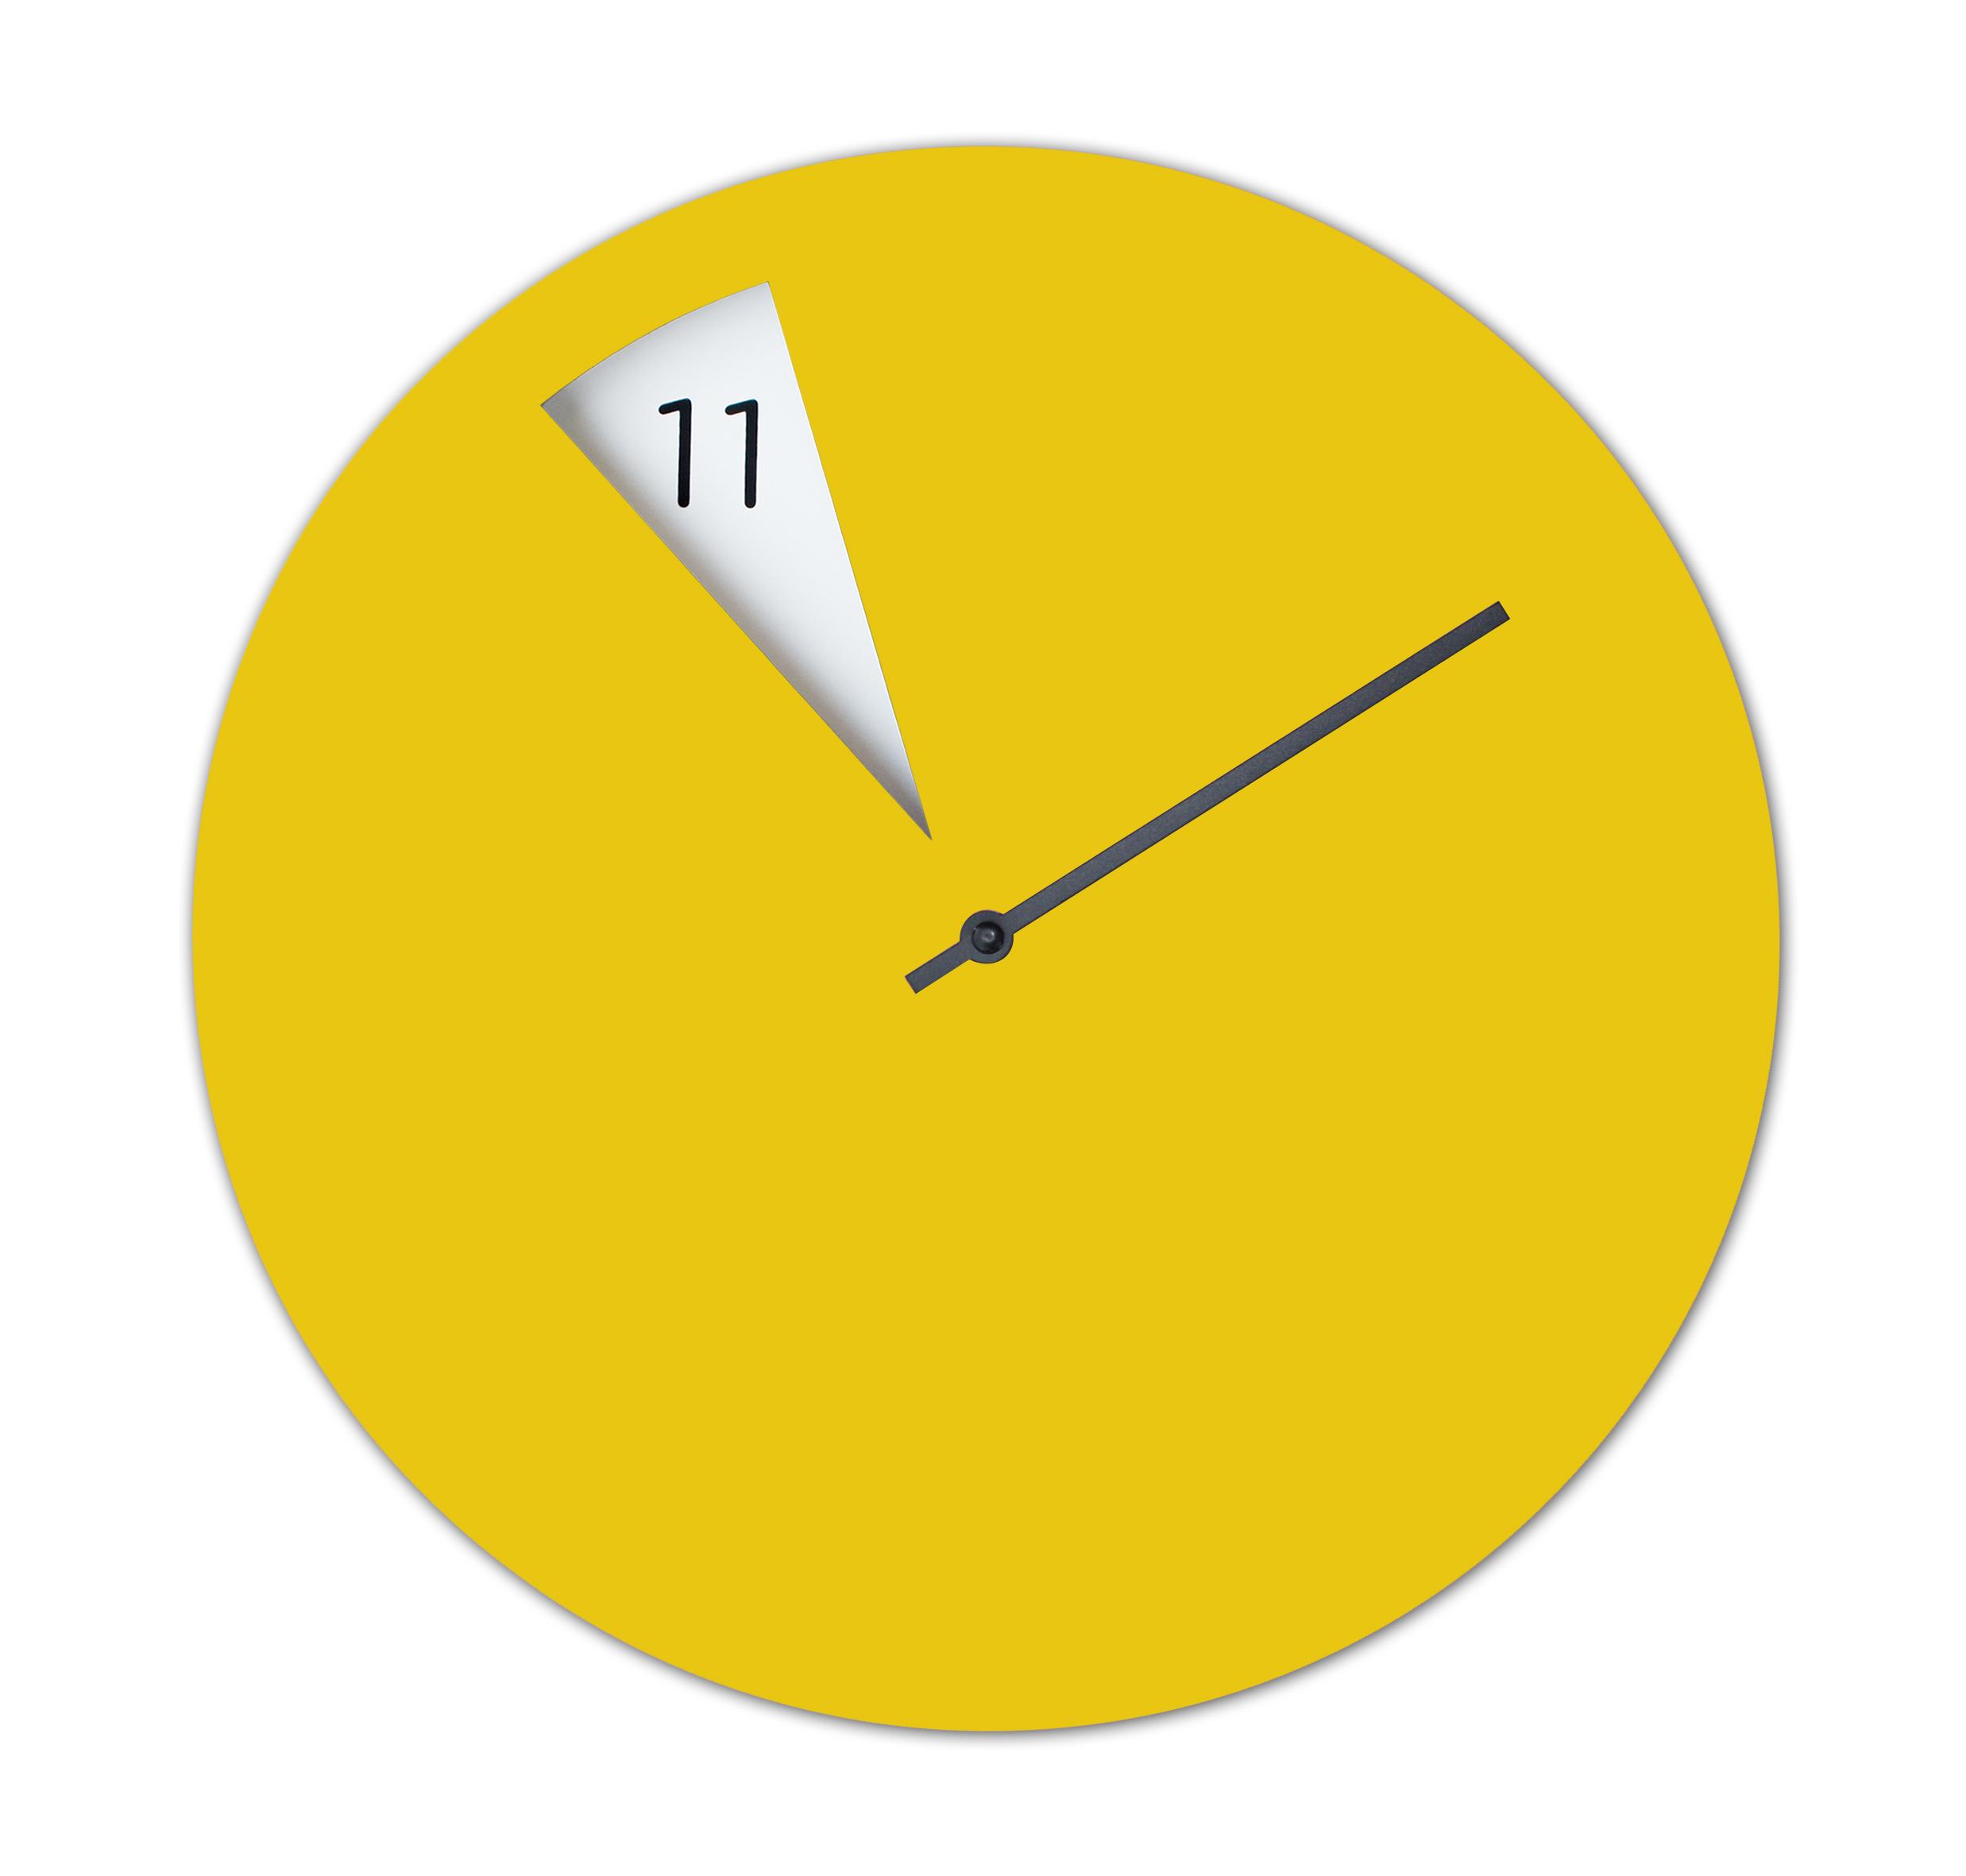 Shop Freakish CLOCK Wall Clock Yellow on CROWDYHOUSE